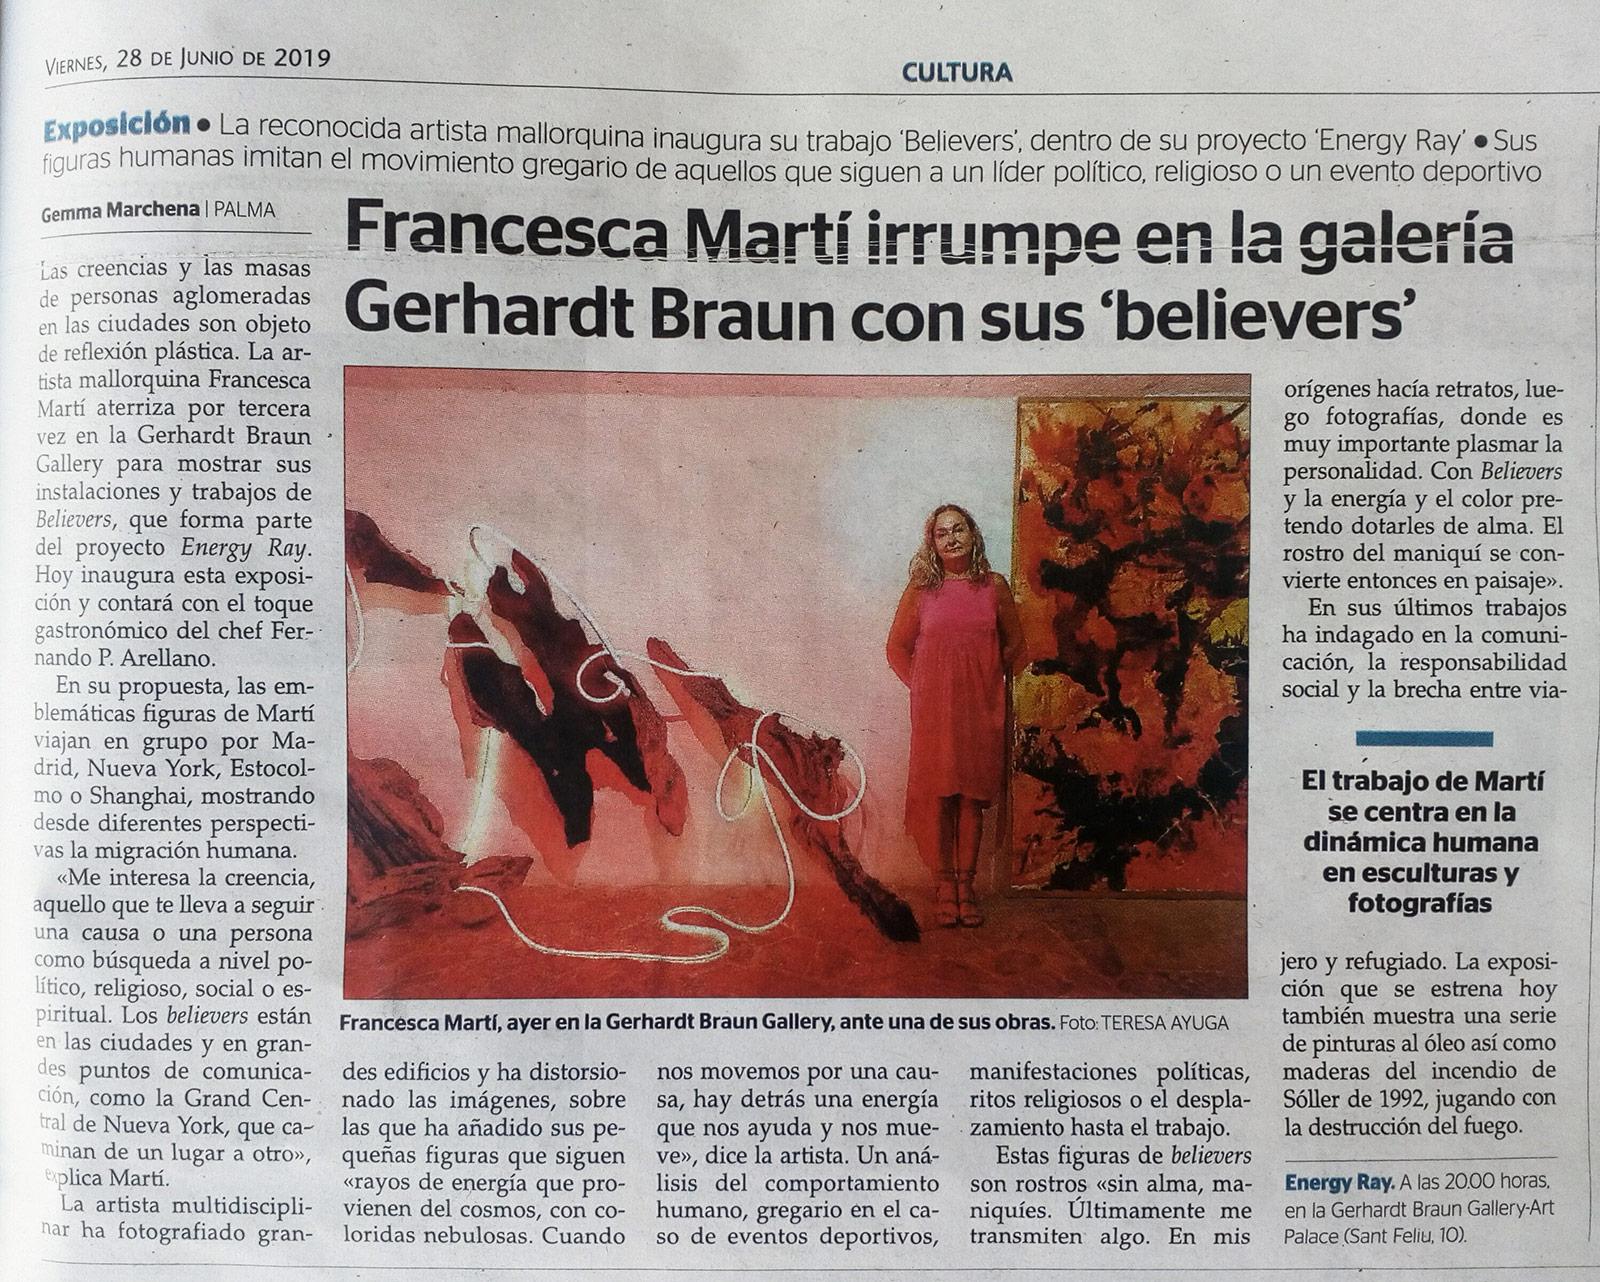 francesca-marti-gerhardt-braun2